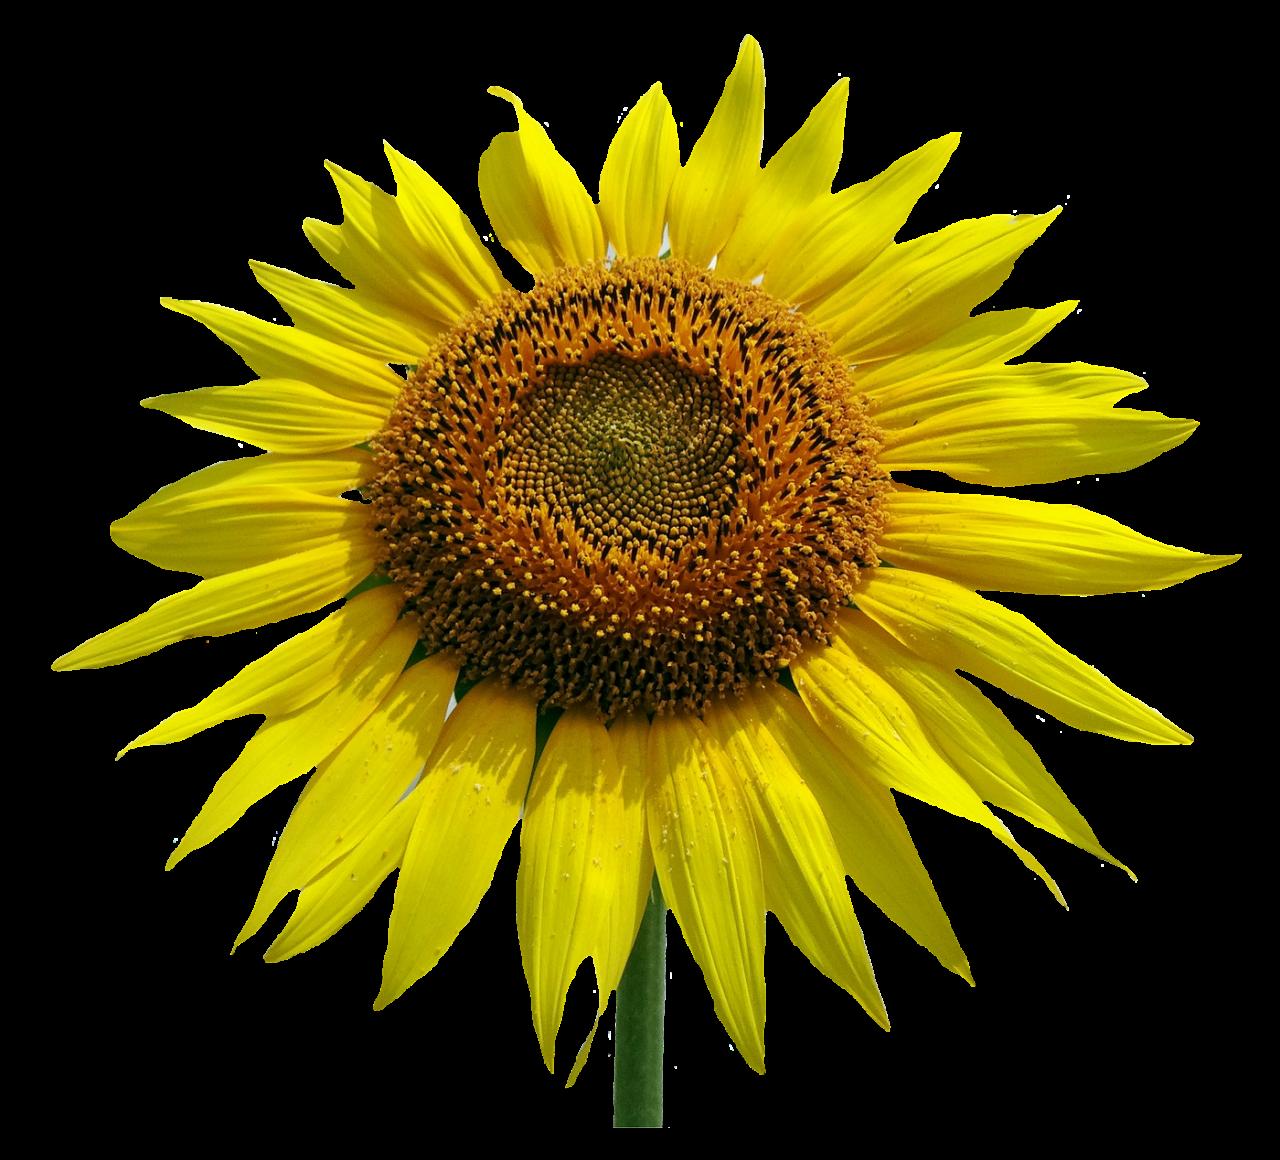 Sunflower Flower PNG Image